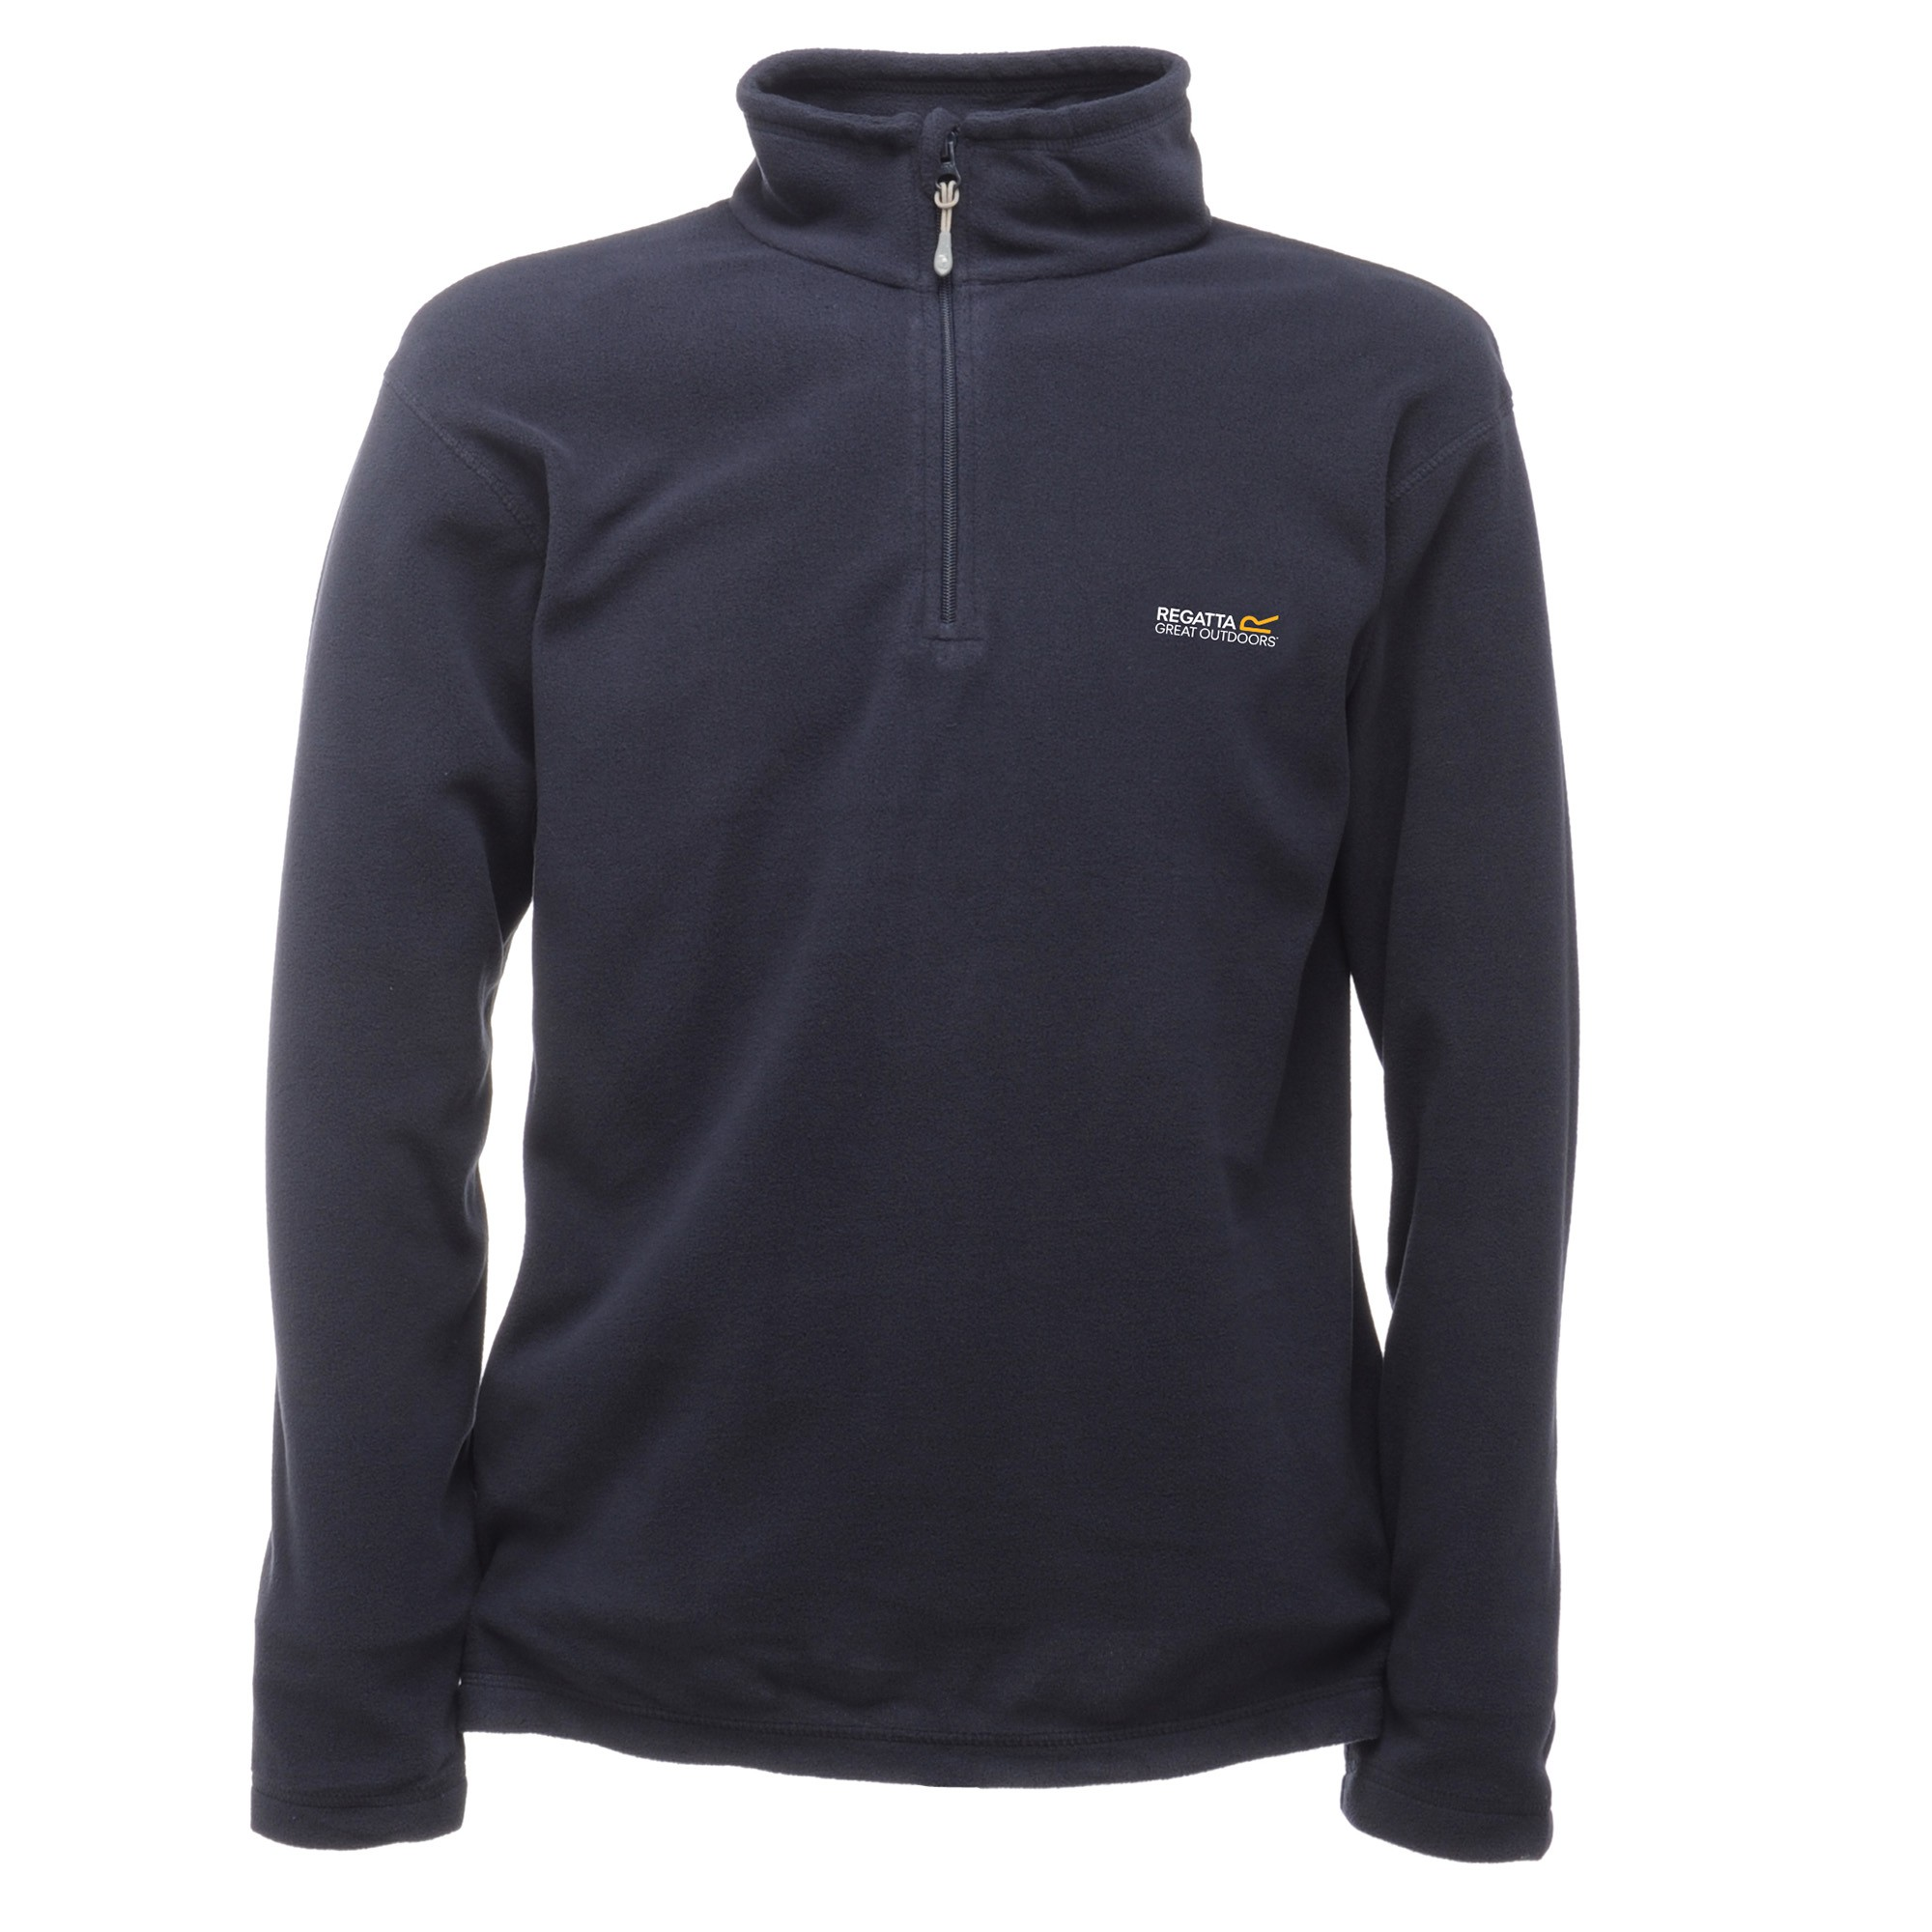 Regatta-Thompson-Mens-ligero-de-secado-rapido-Anti-pildora-polar-chaqueta